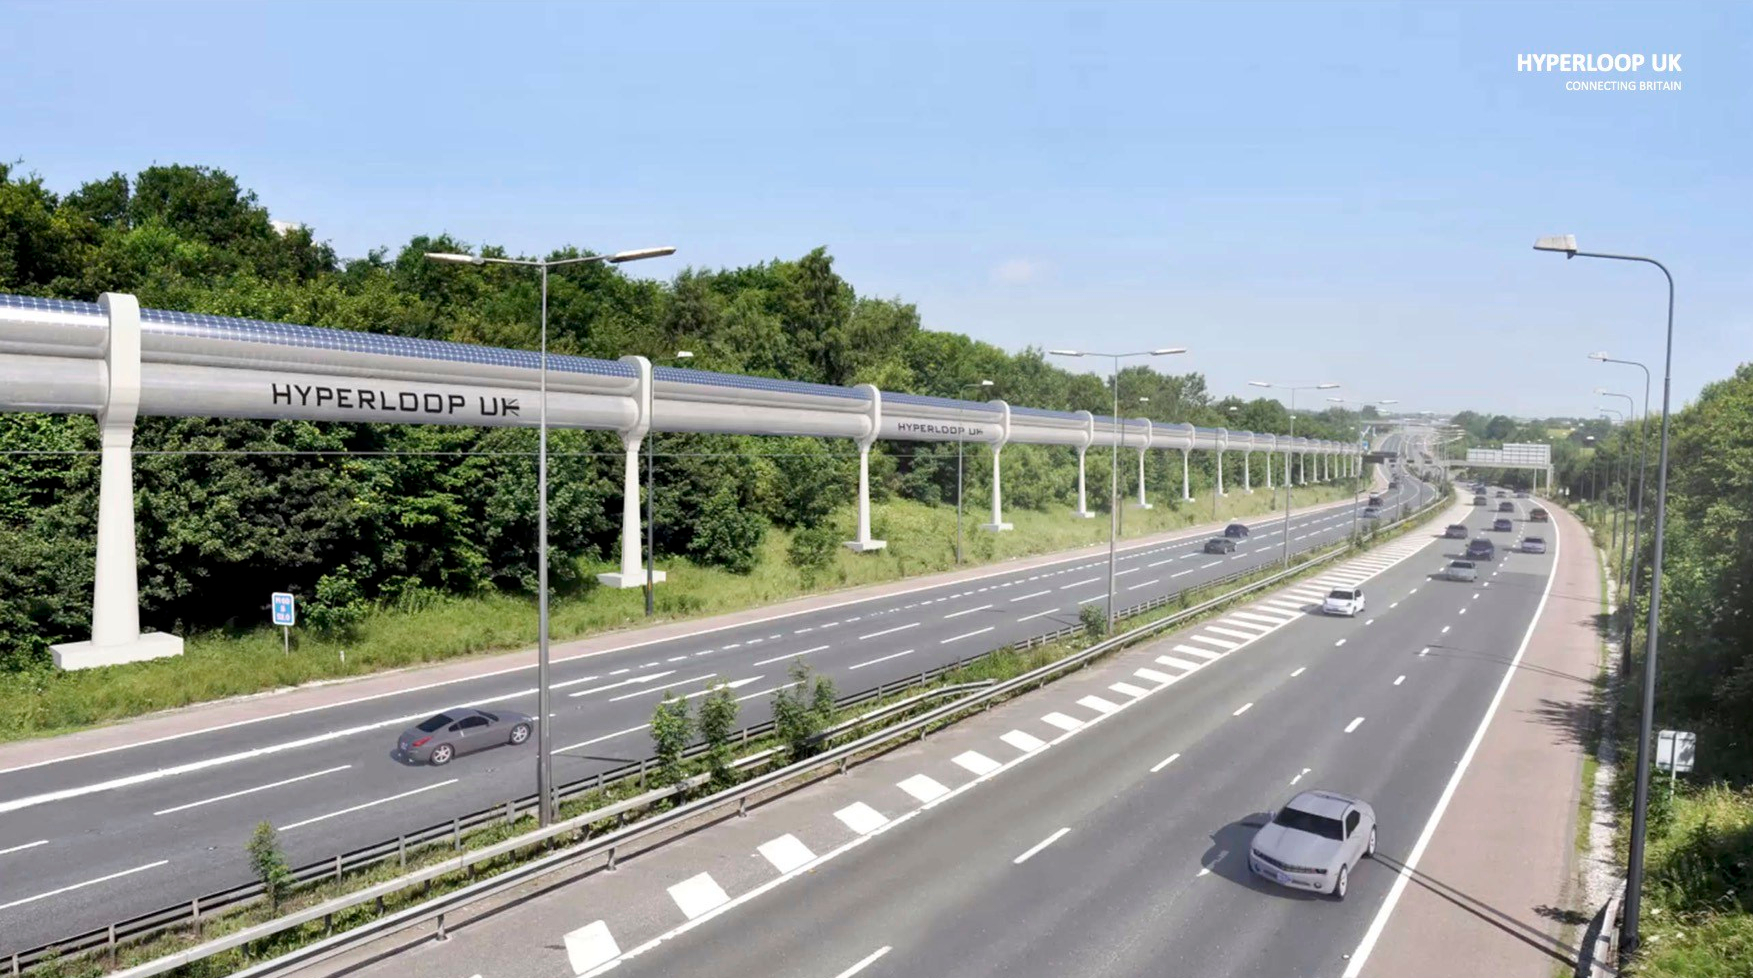 Hyperloop UK image